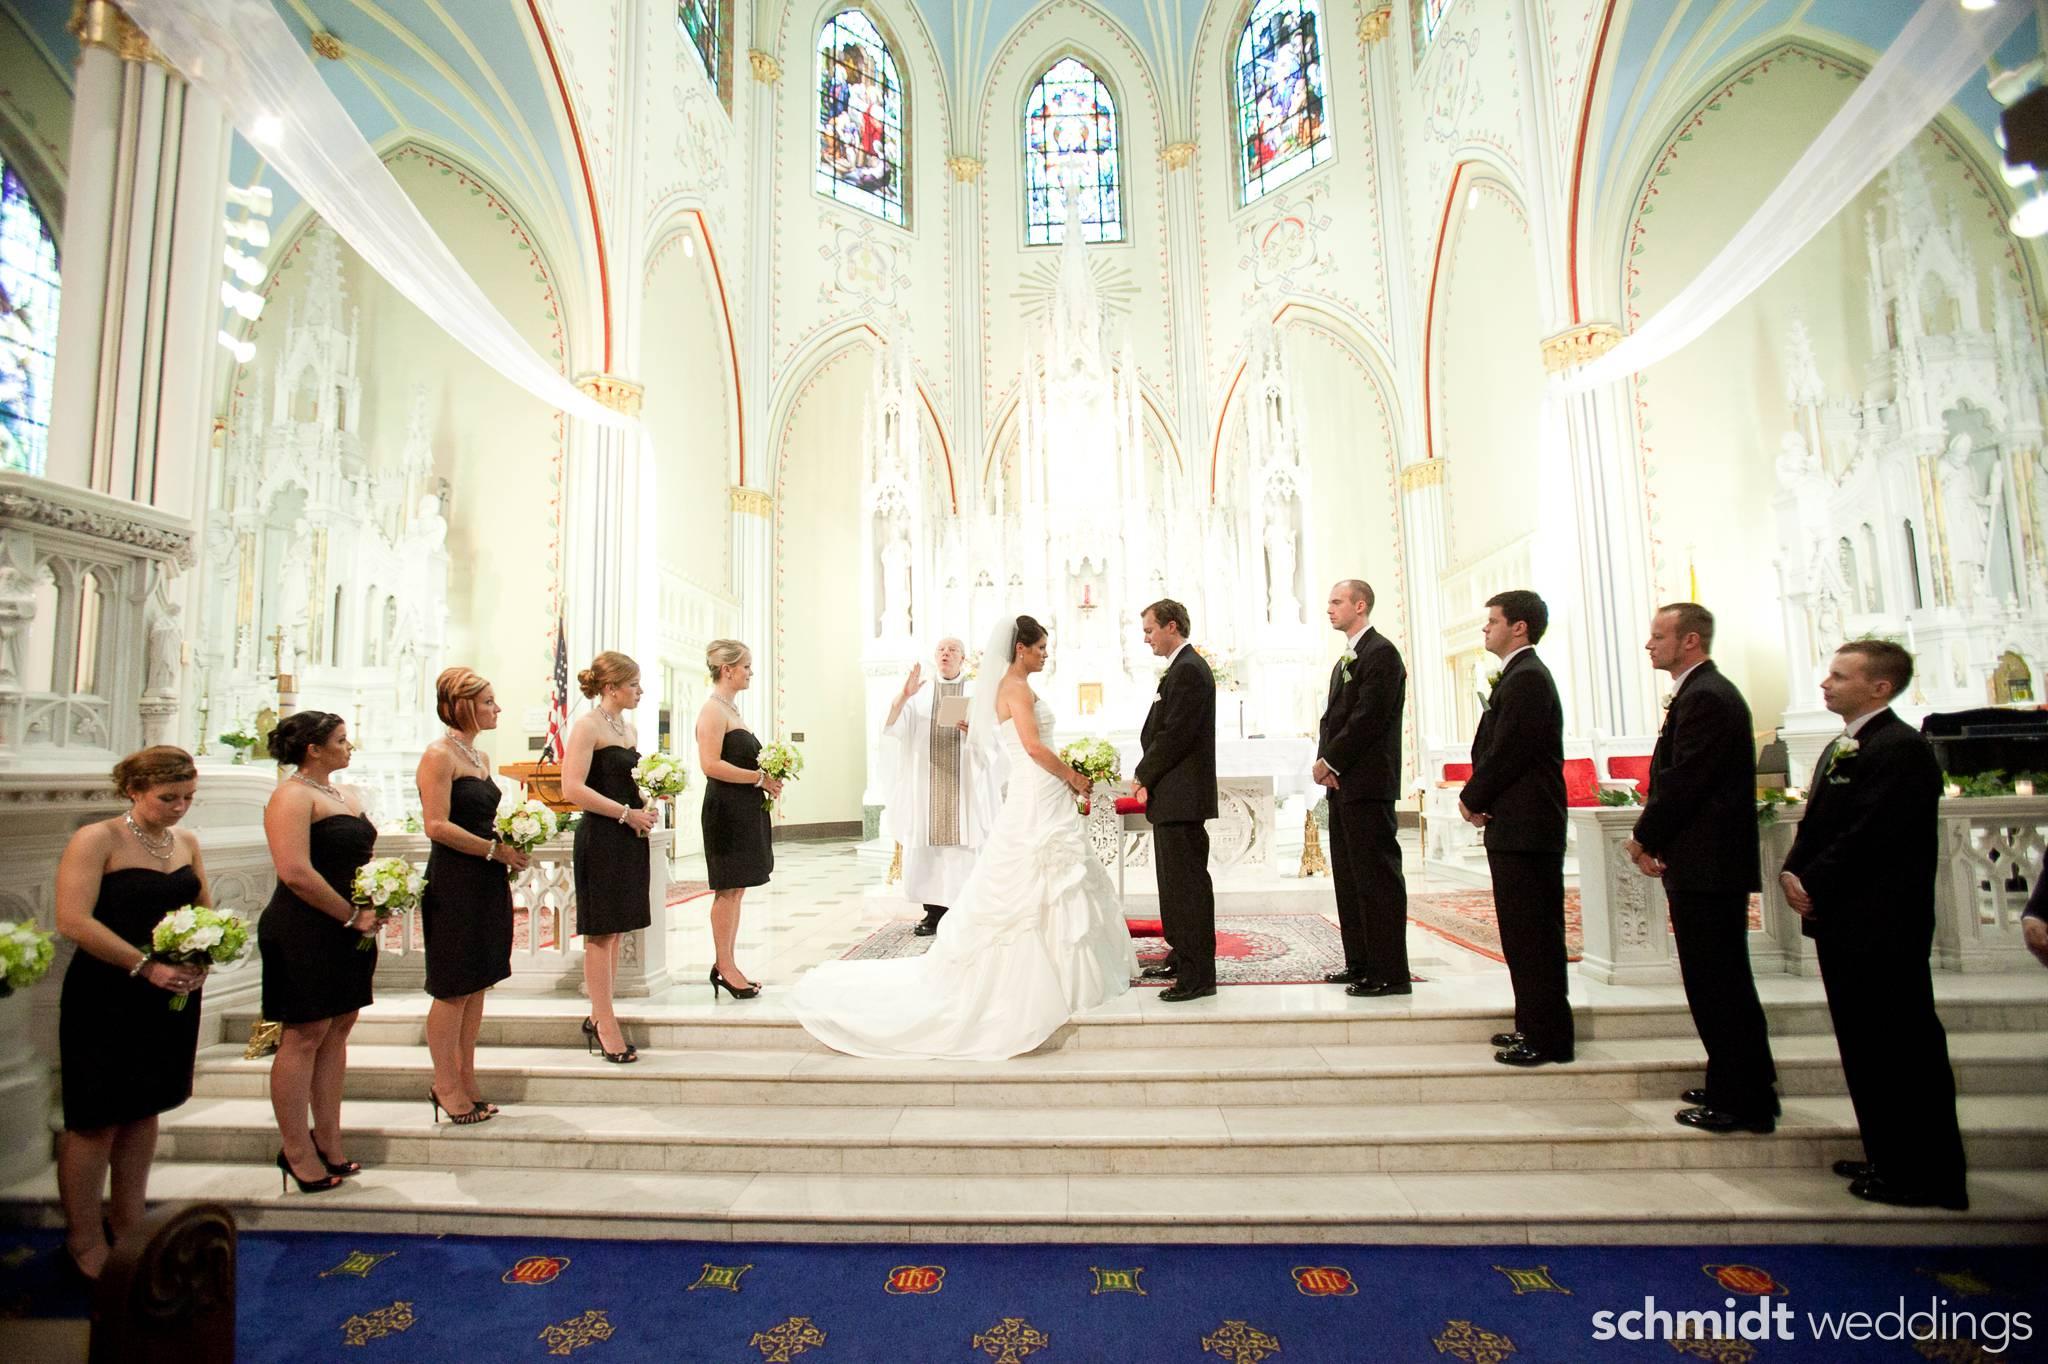 Wedding Photographer Tom Schmidt in Chicago and KC